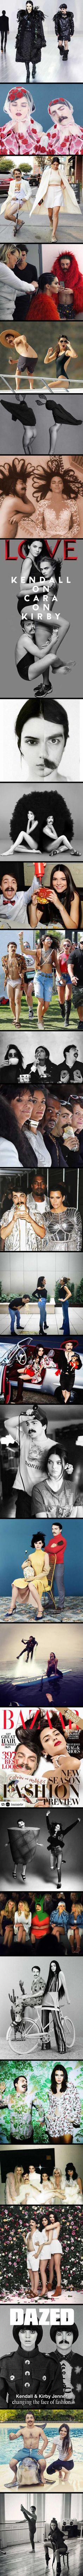 Kendall Jenner's Secret Twin, Kirby Jenner, Photoshops Himself Into Her Instagram Photos make it 1,000% better